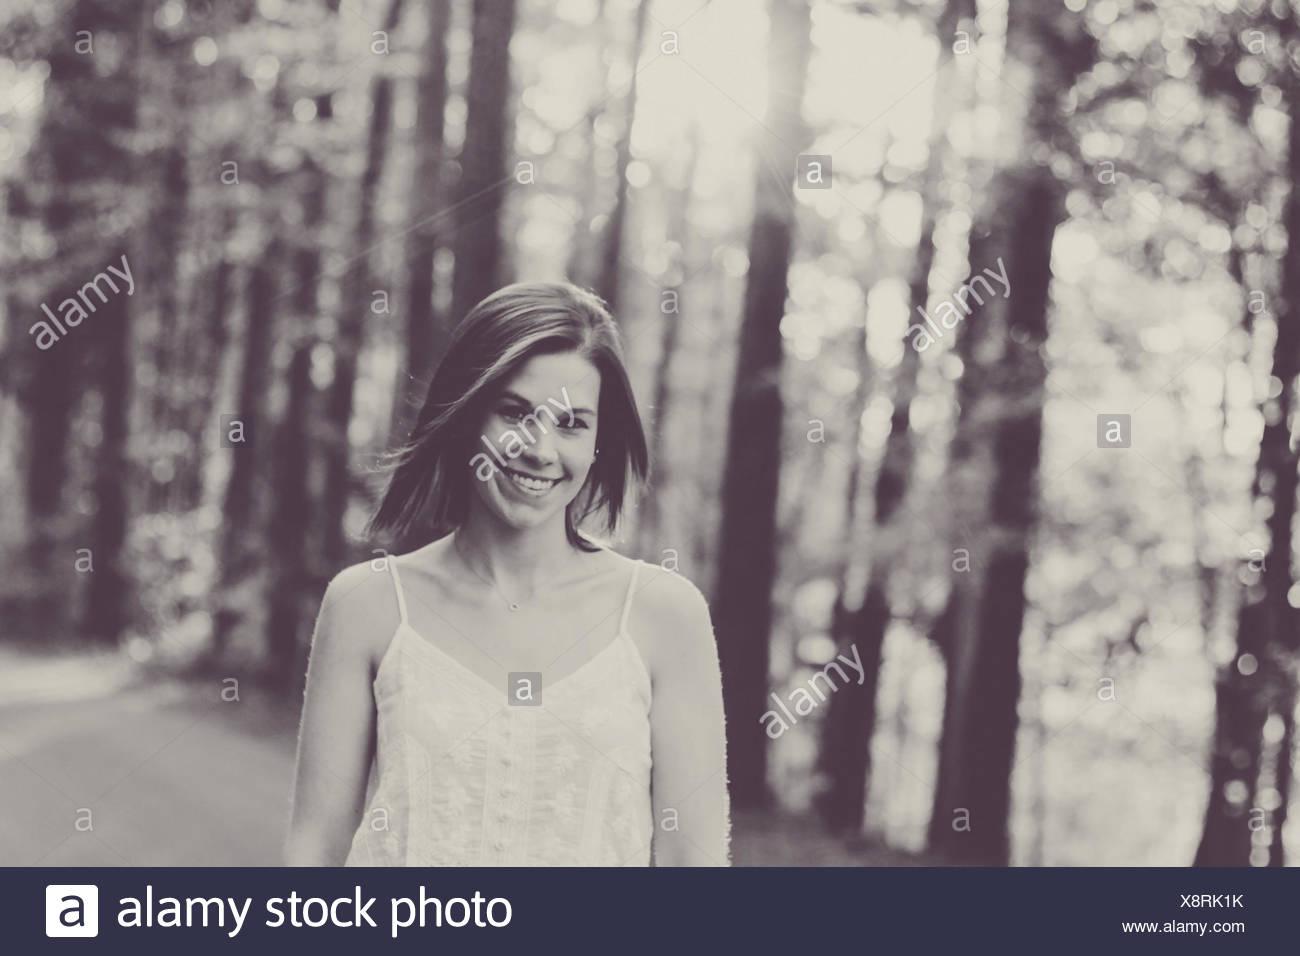 Woman walking down road during springtime - Stock Image